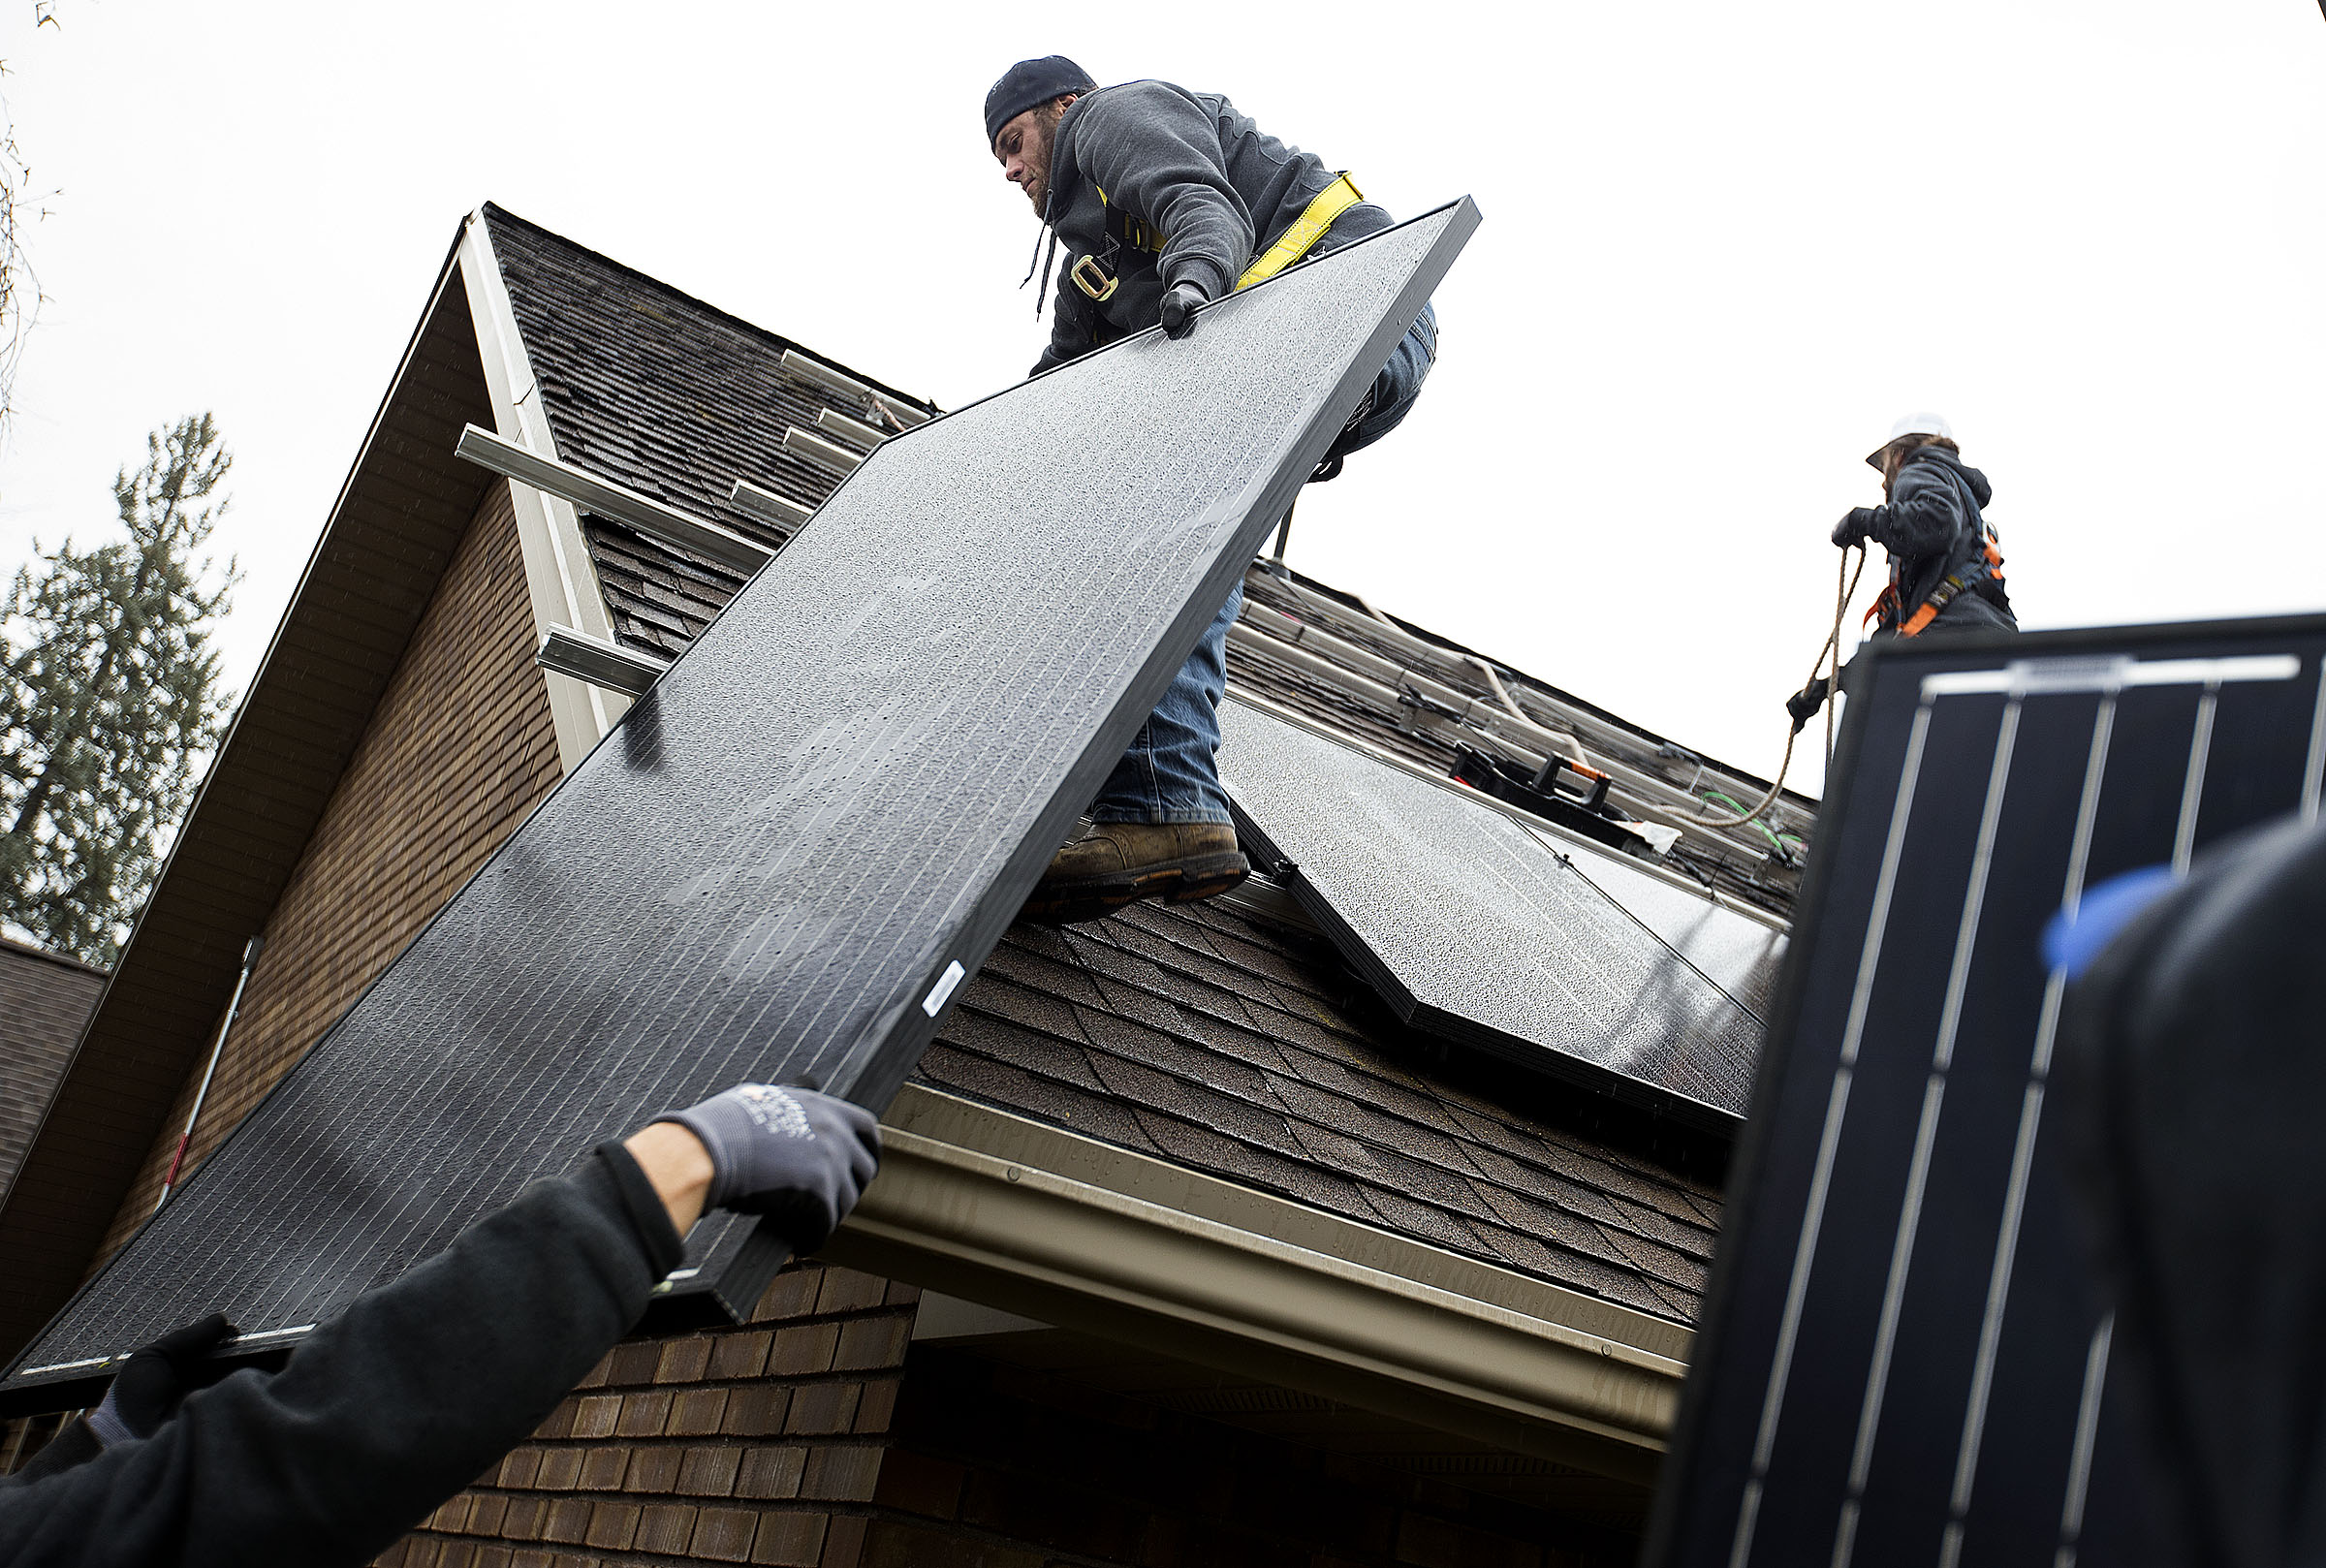 Justin Kourbelas and Tyler Eichmeier, of Go Solar Energy, install solar panels on a house in Holladay on Friday, April 6, 2018.